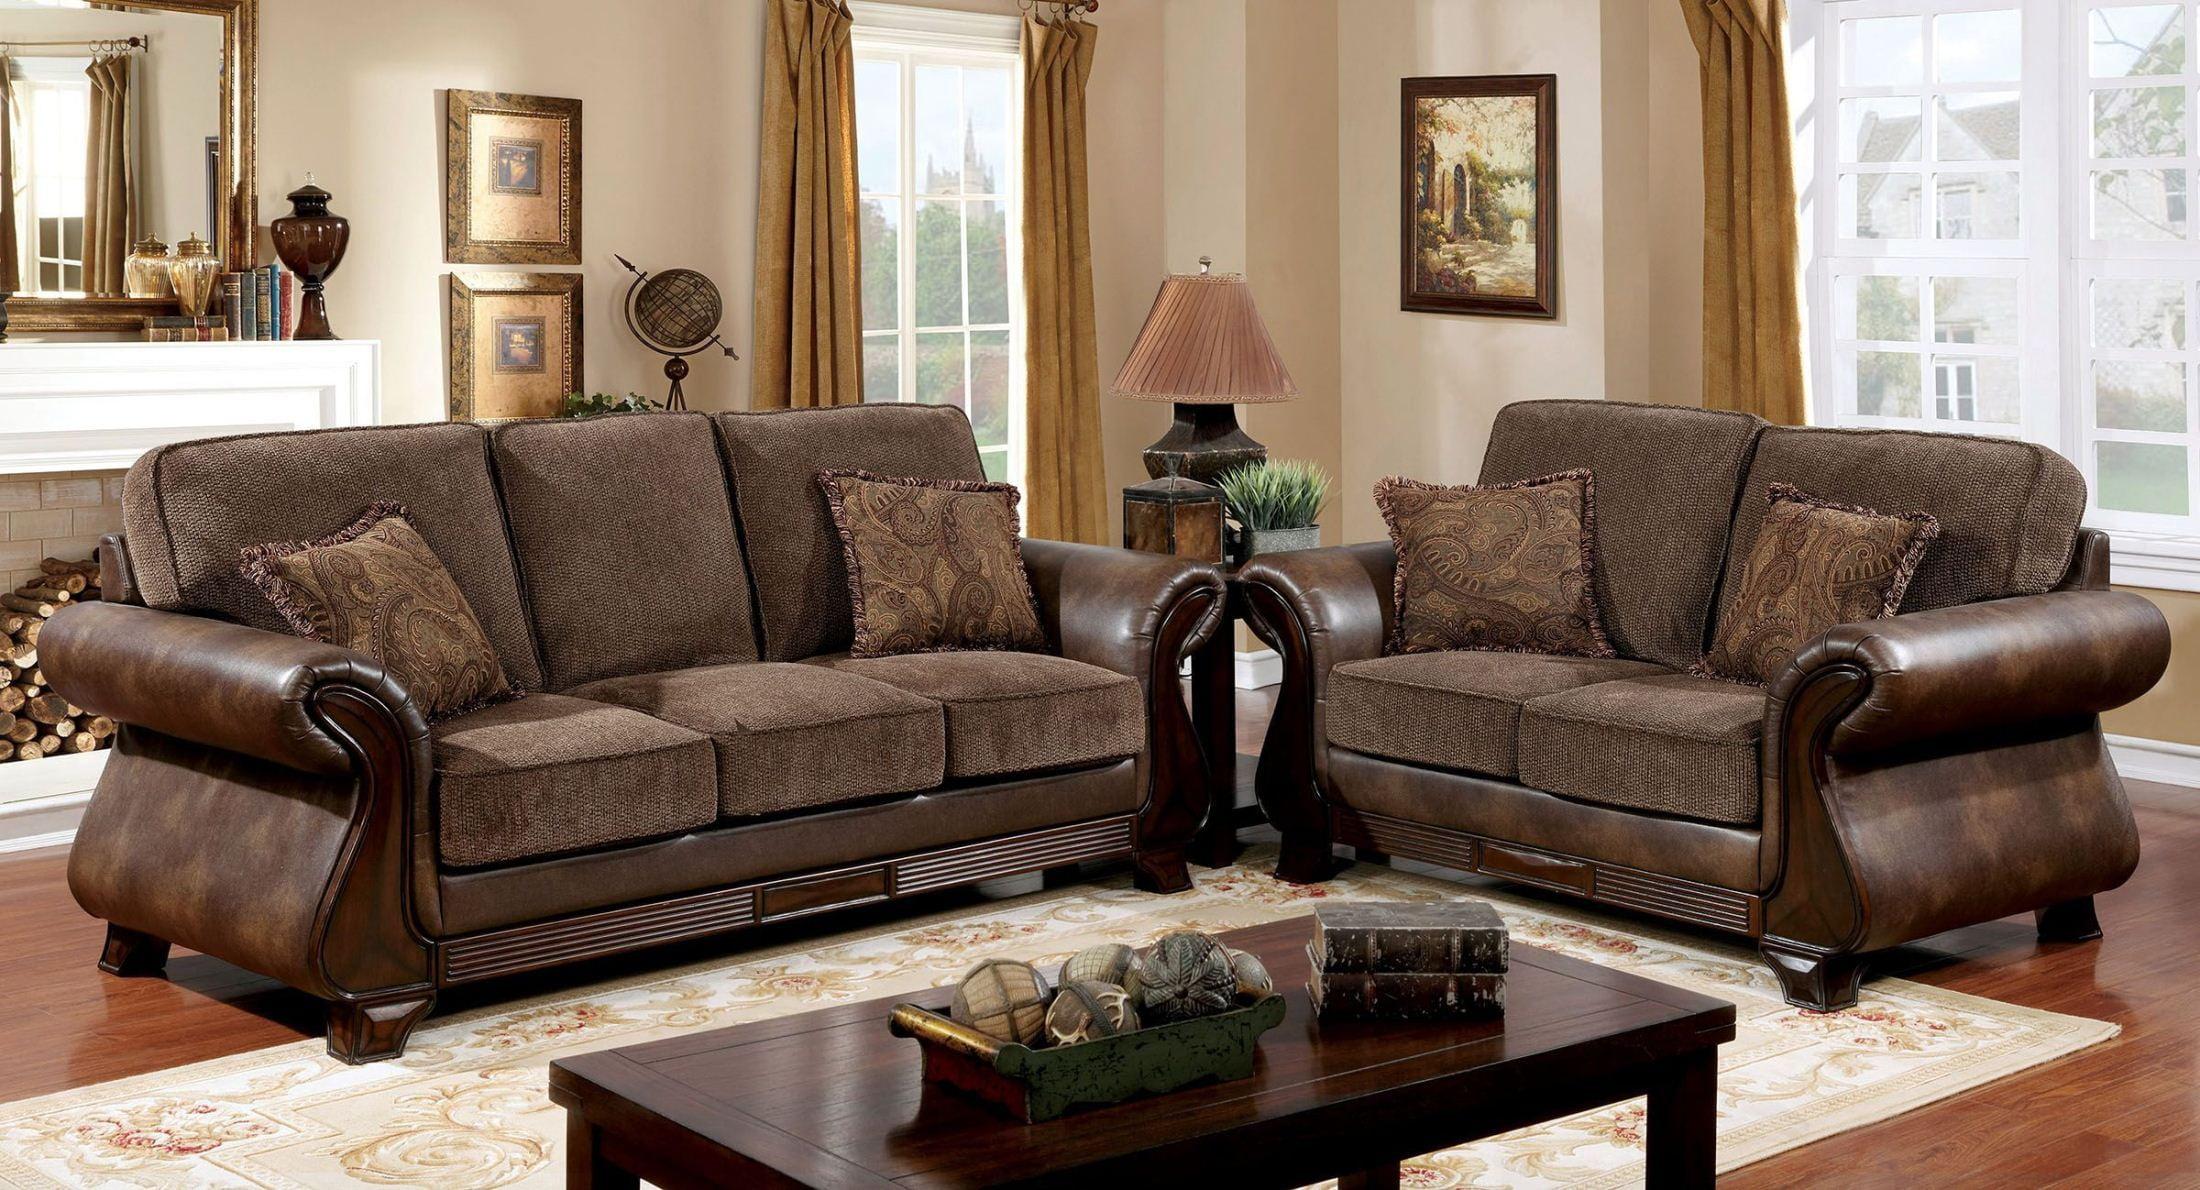 807e1761678bd3 Montgomery Mocha Living Room Set from Ashley (3830038)   Coleman ...